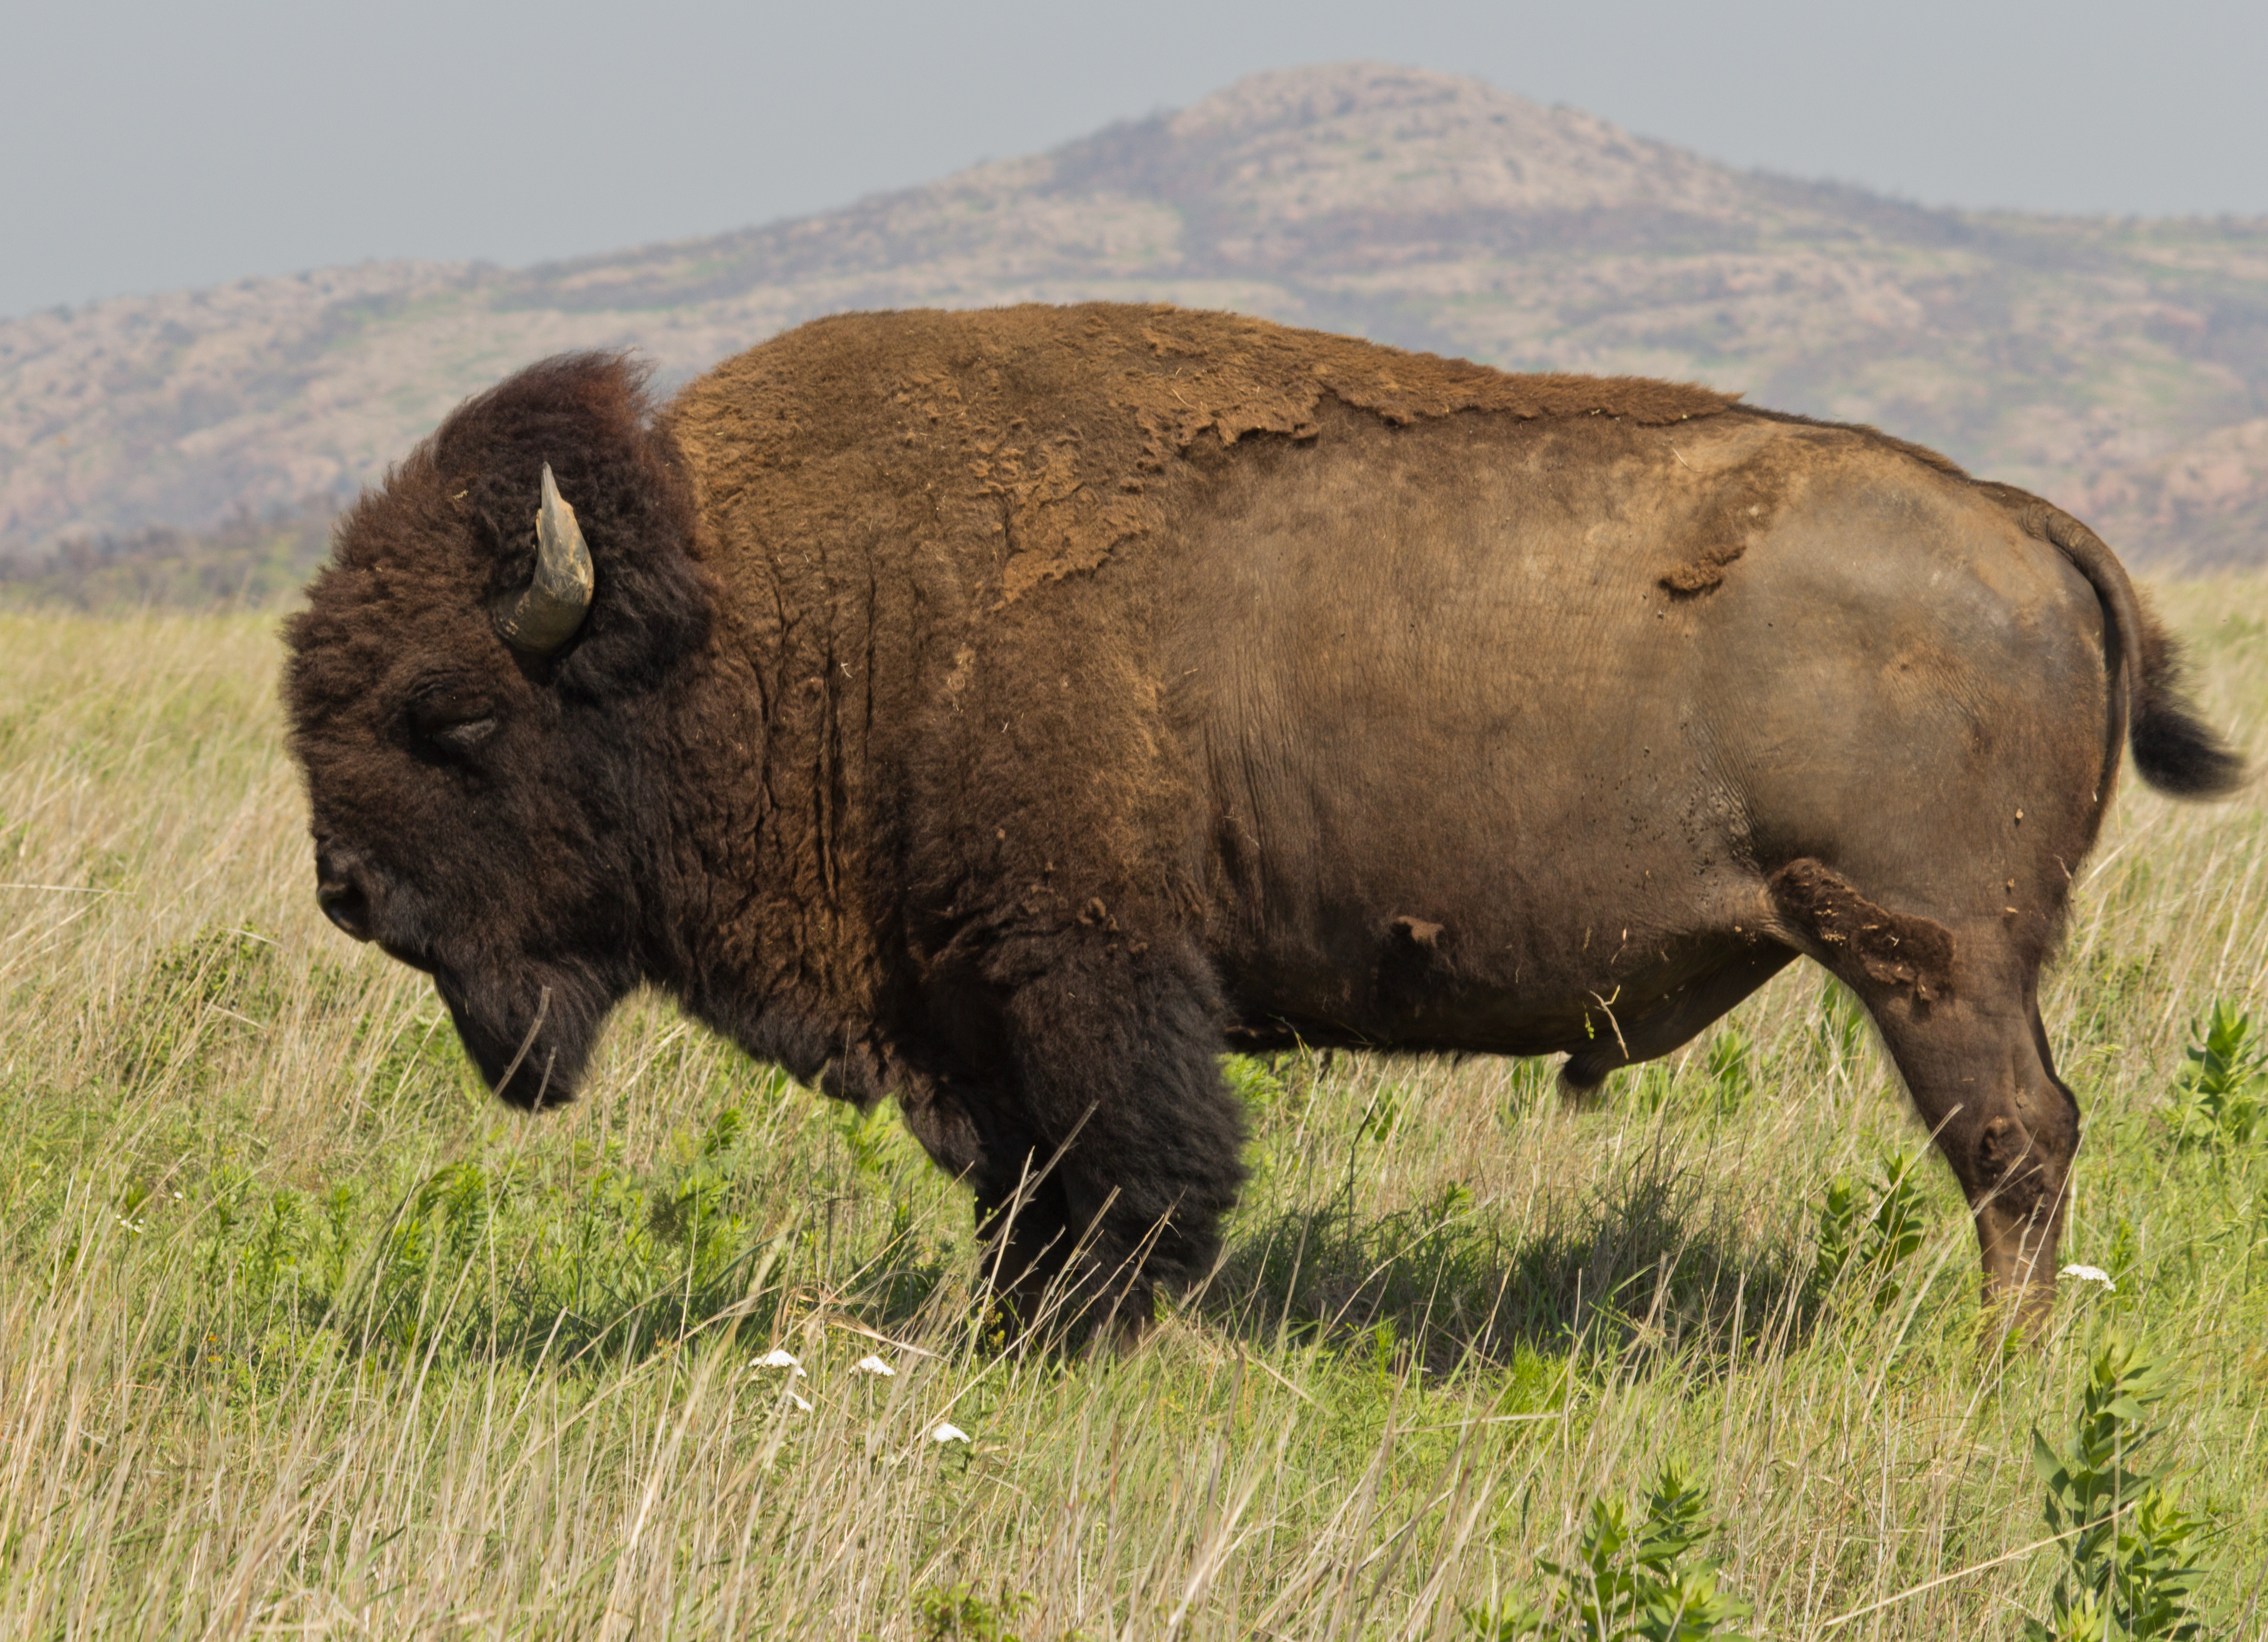 Bison Oklahoma File:Bison bison Wichi...